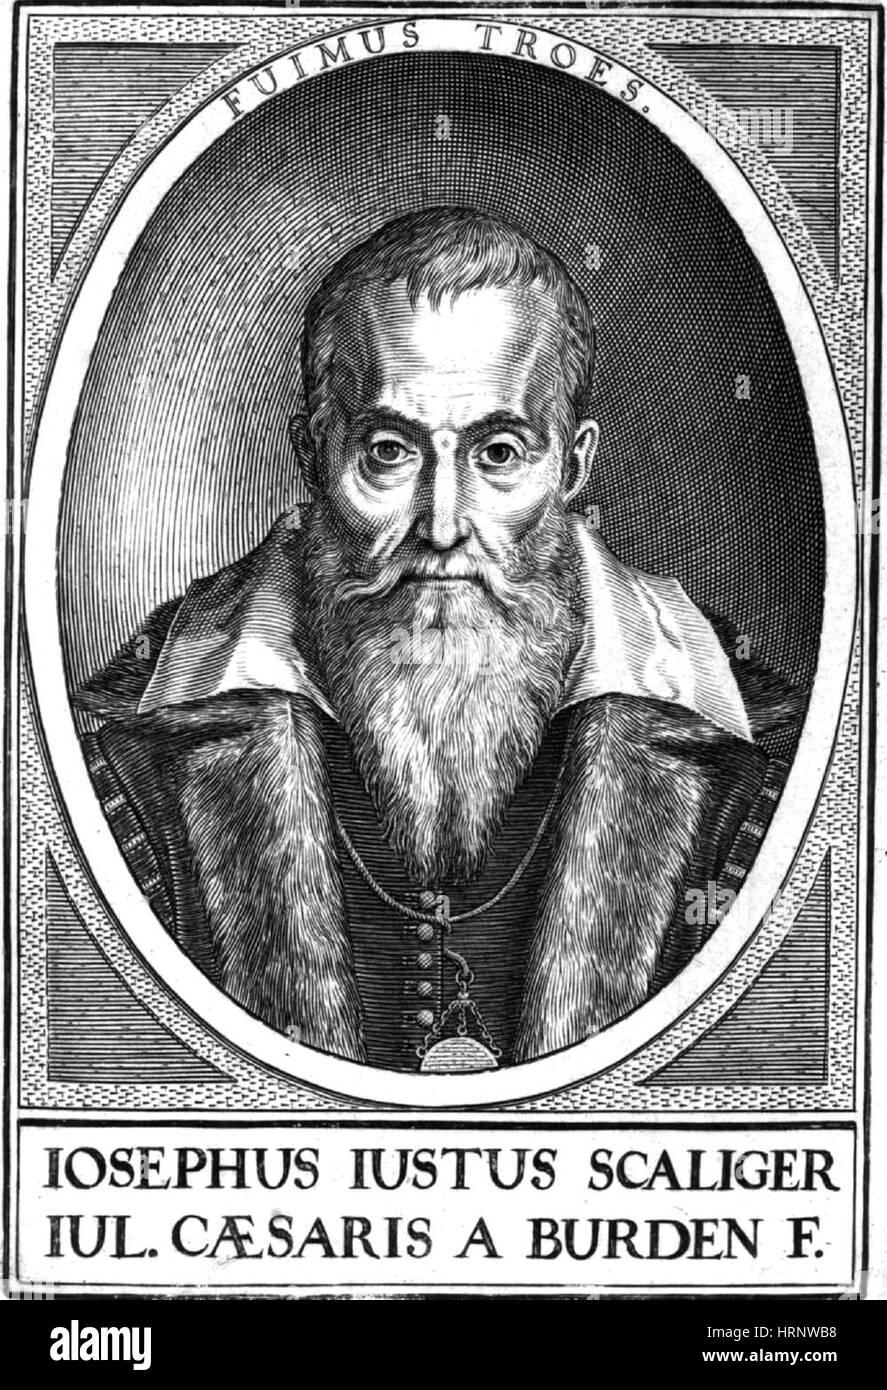 Josephus Justus Scaliger, French Scholar - Stock Image